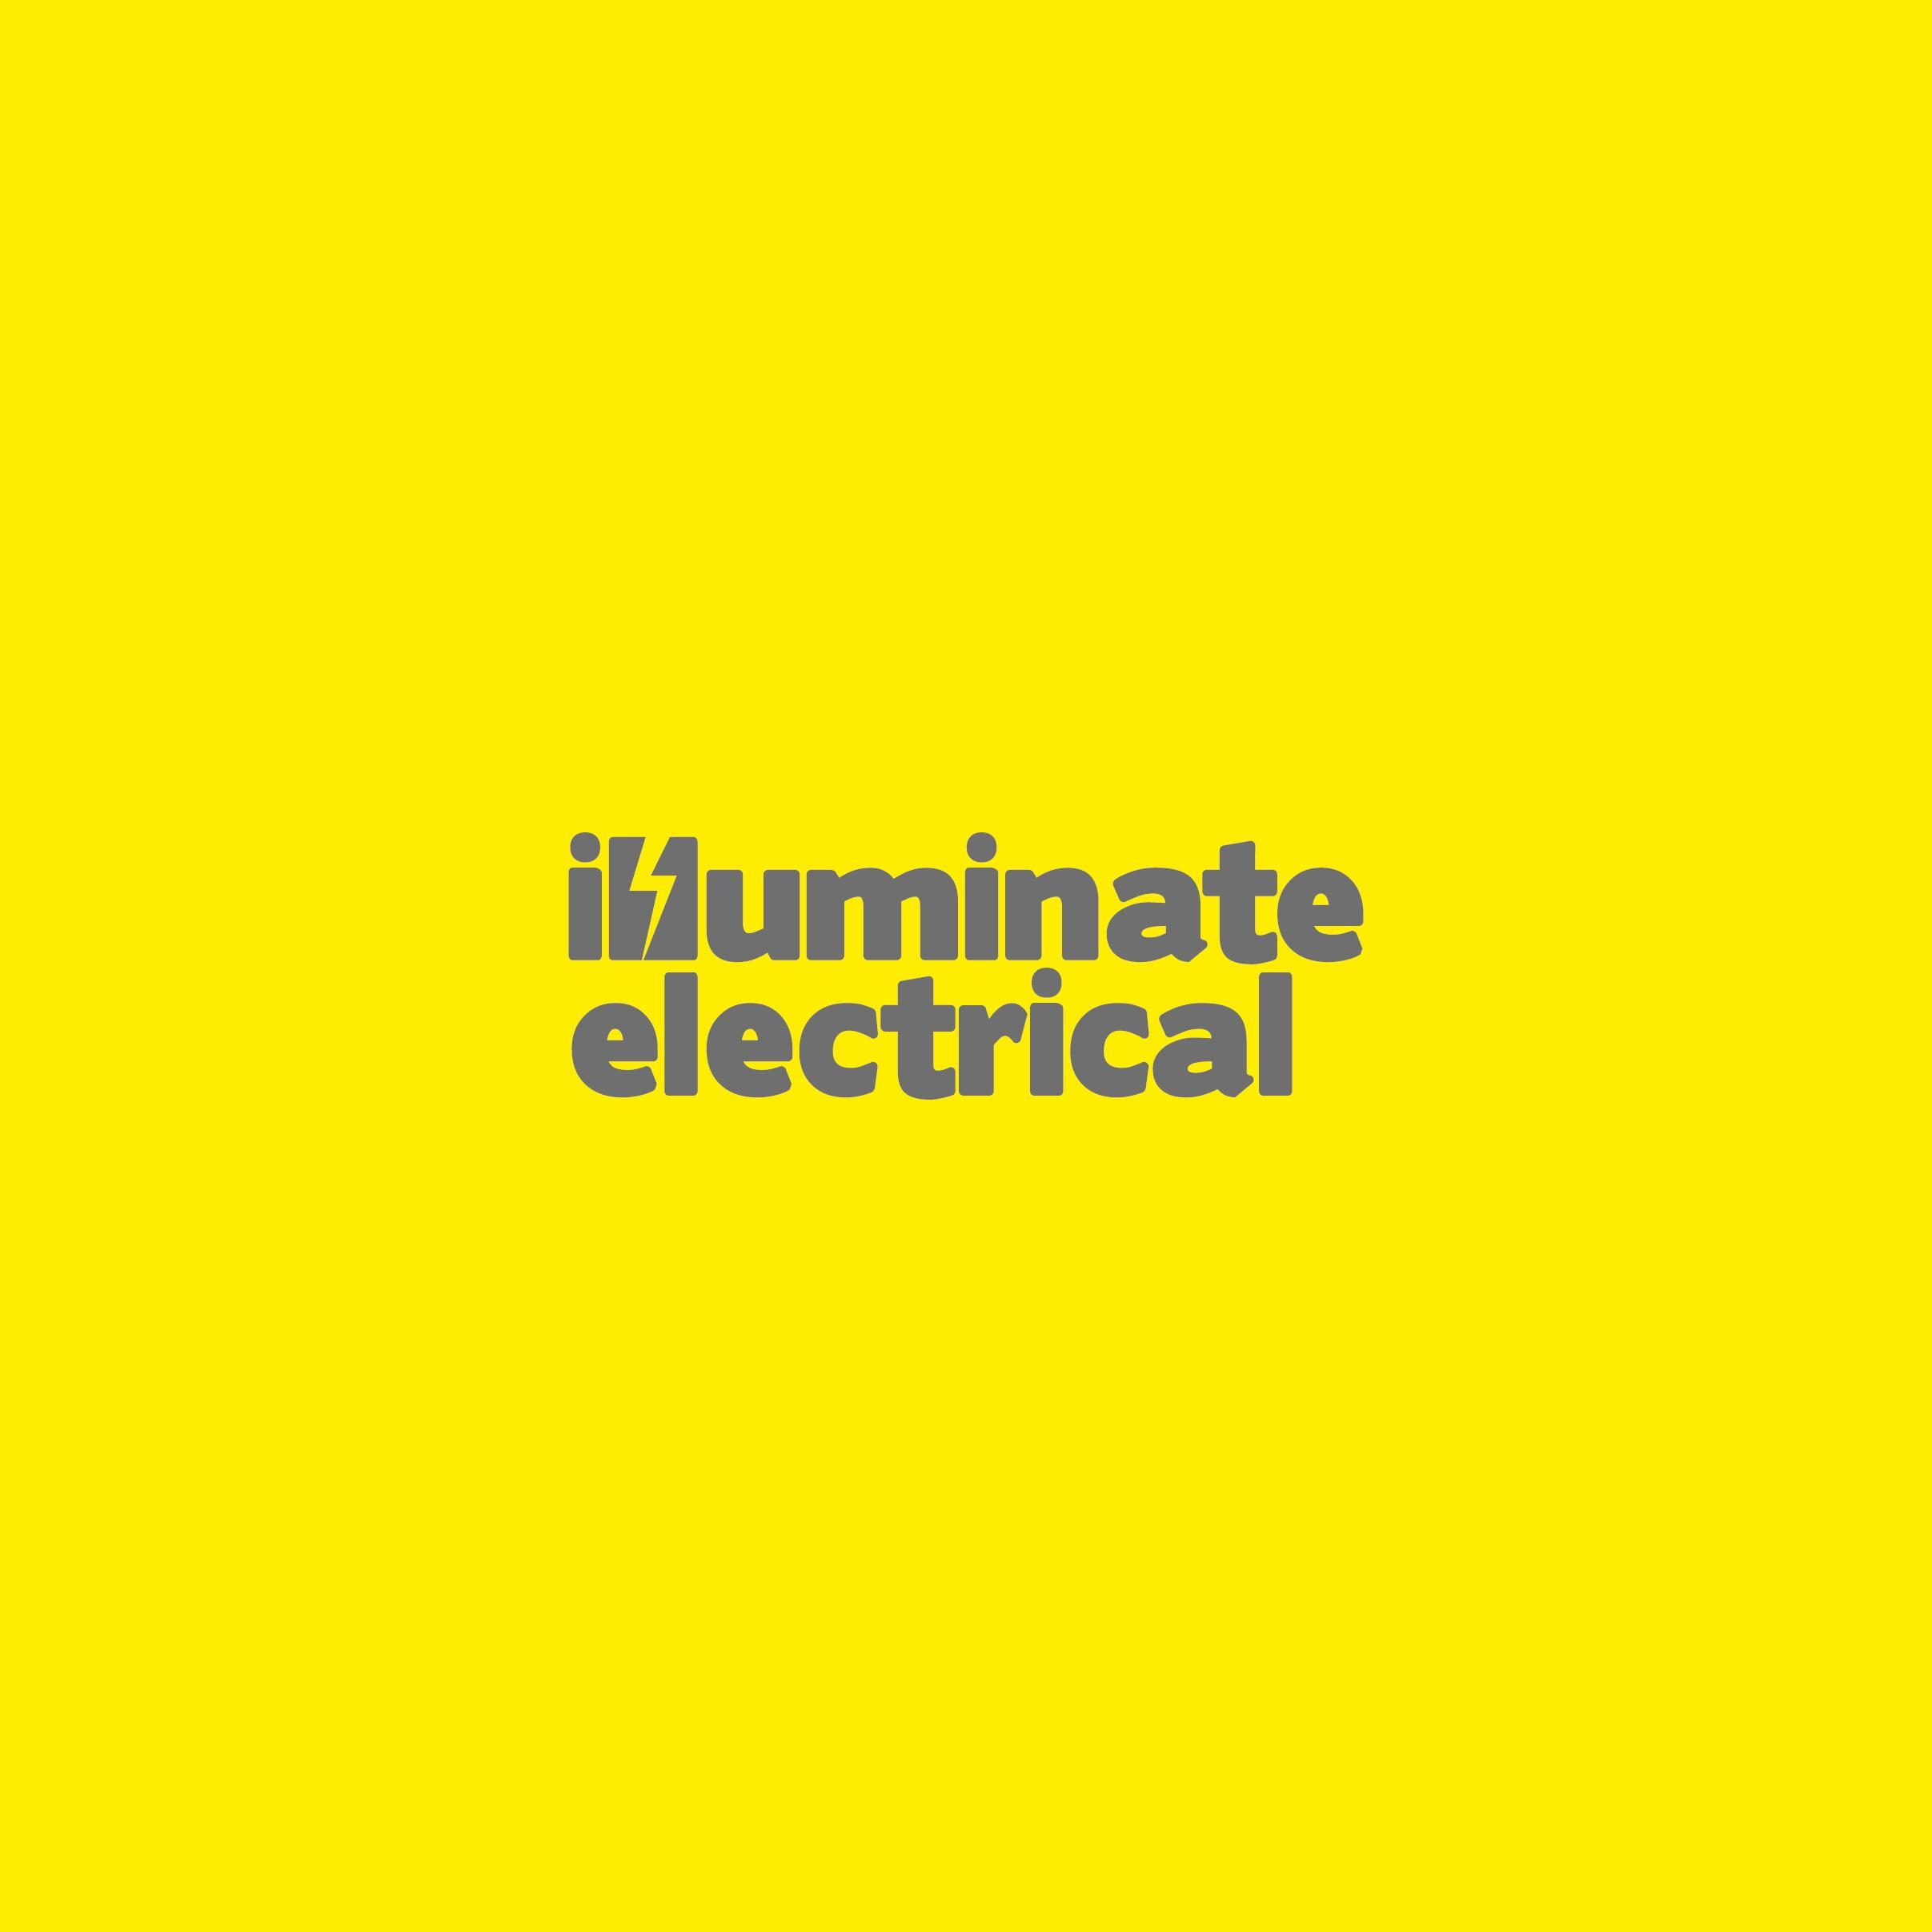 Electrical company needs professional and stylish logo